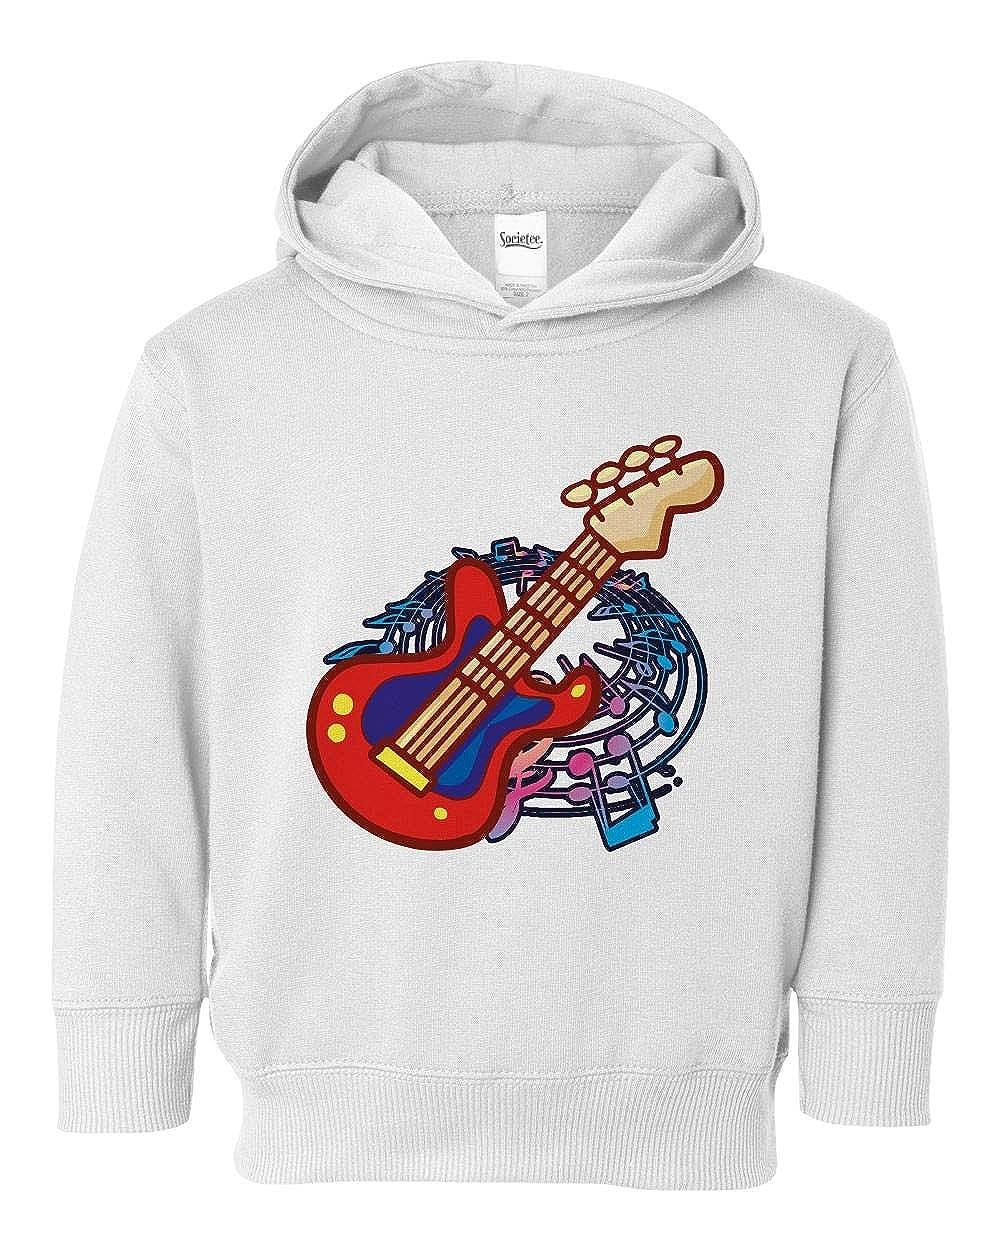 Societee Electric Guitar Music Cute Girls Boys Toddler Hooded Sweatshirt